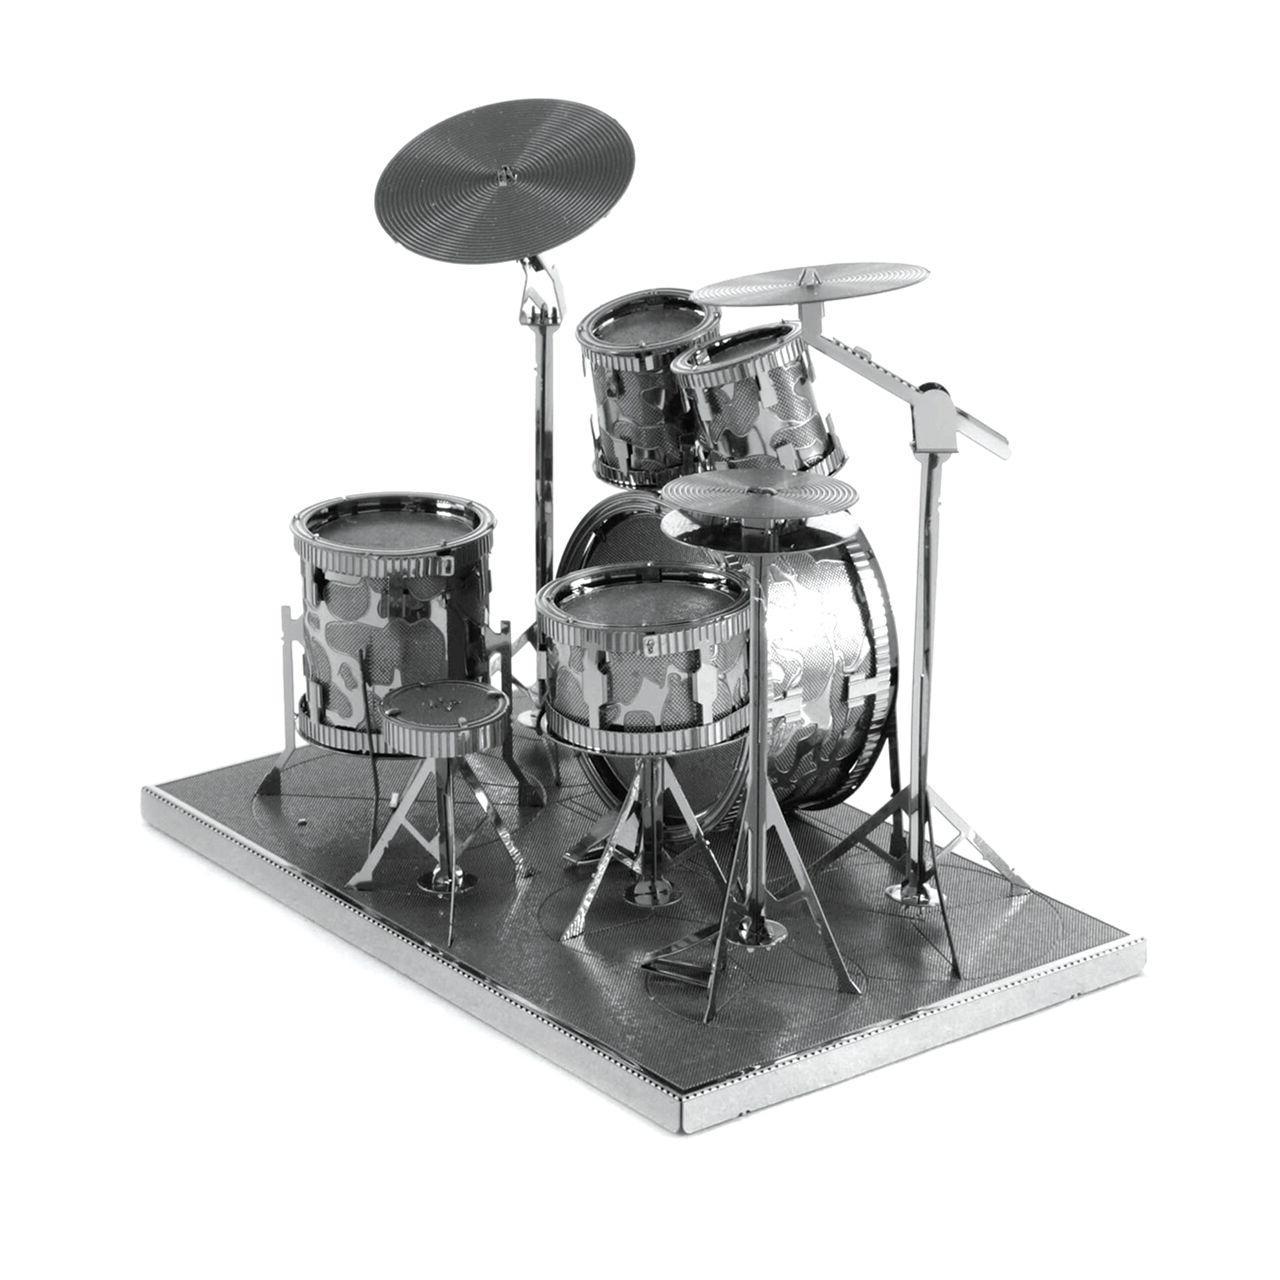 Fascinations Drum Set 3D Cut Steel Instrument Kit